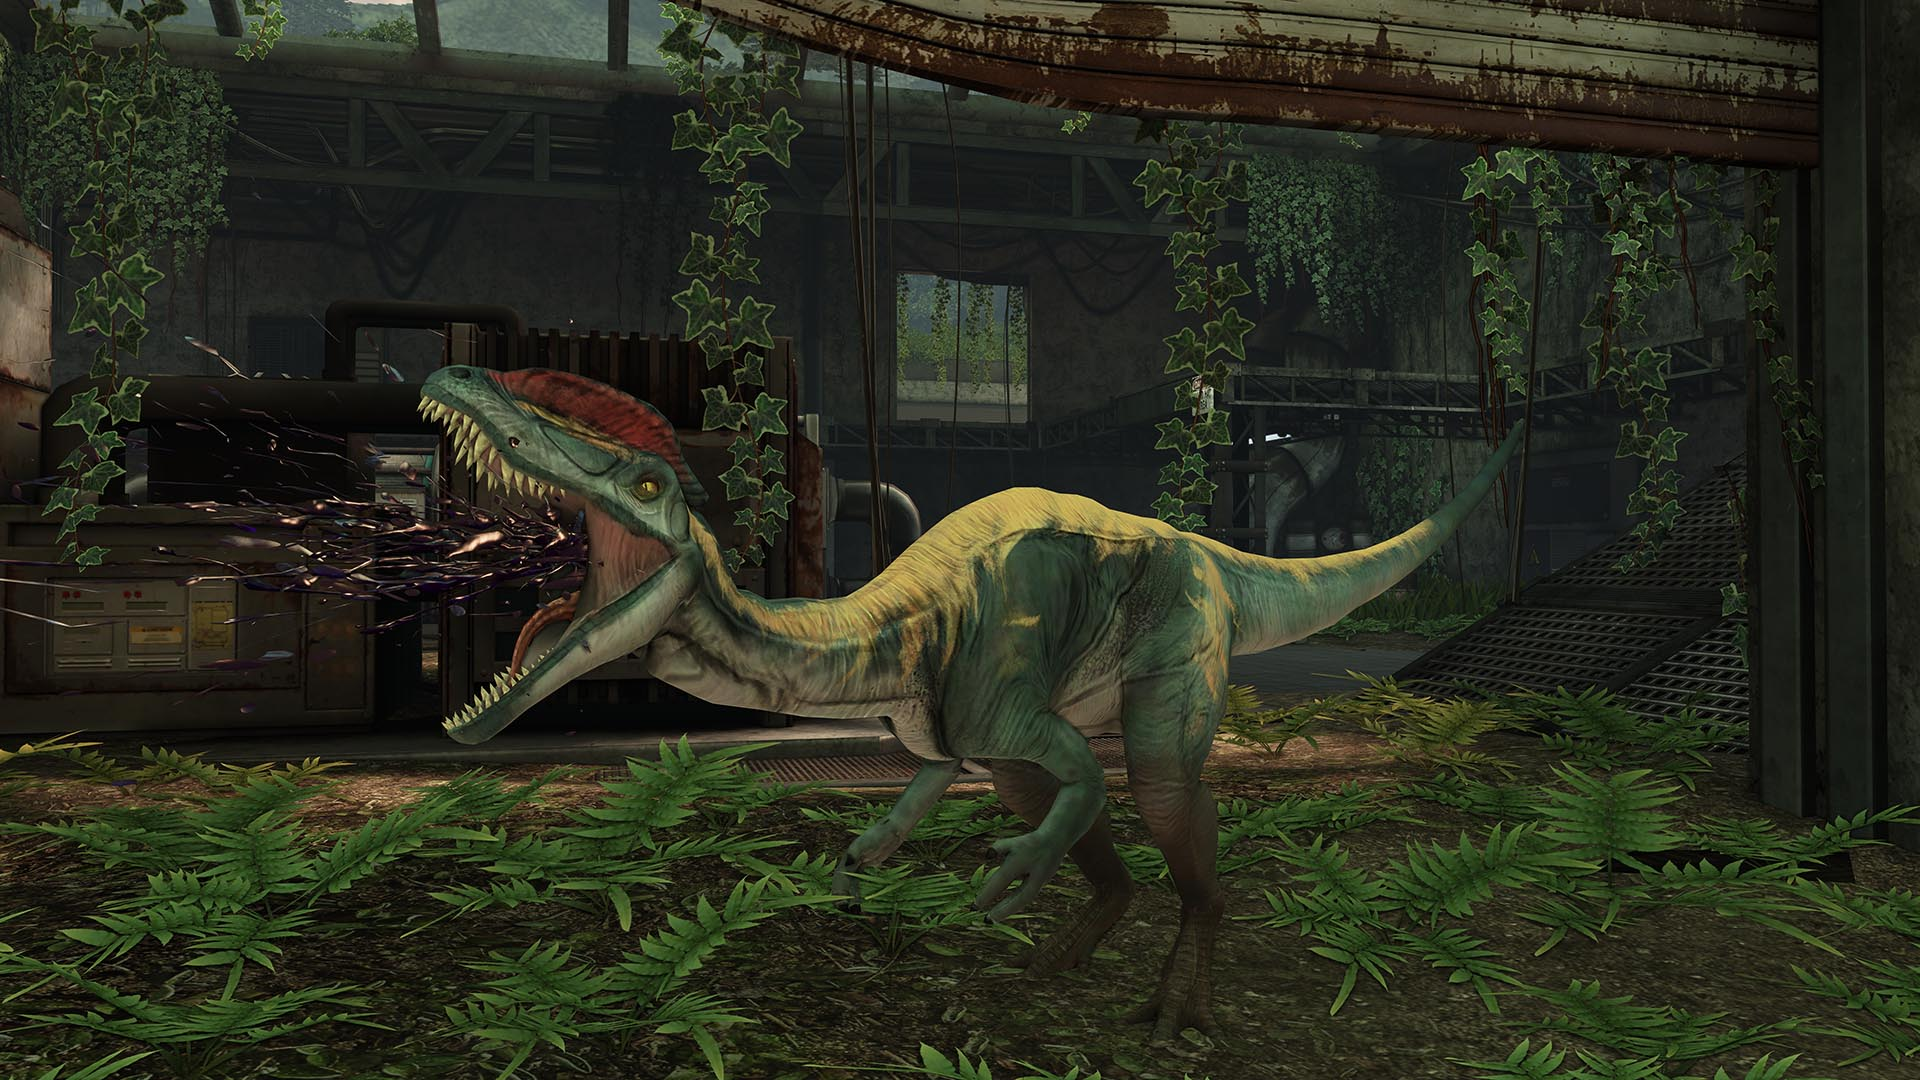 dilophosaurus primal carnage - photo #12